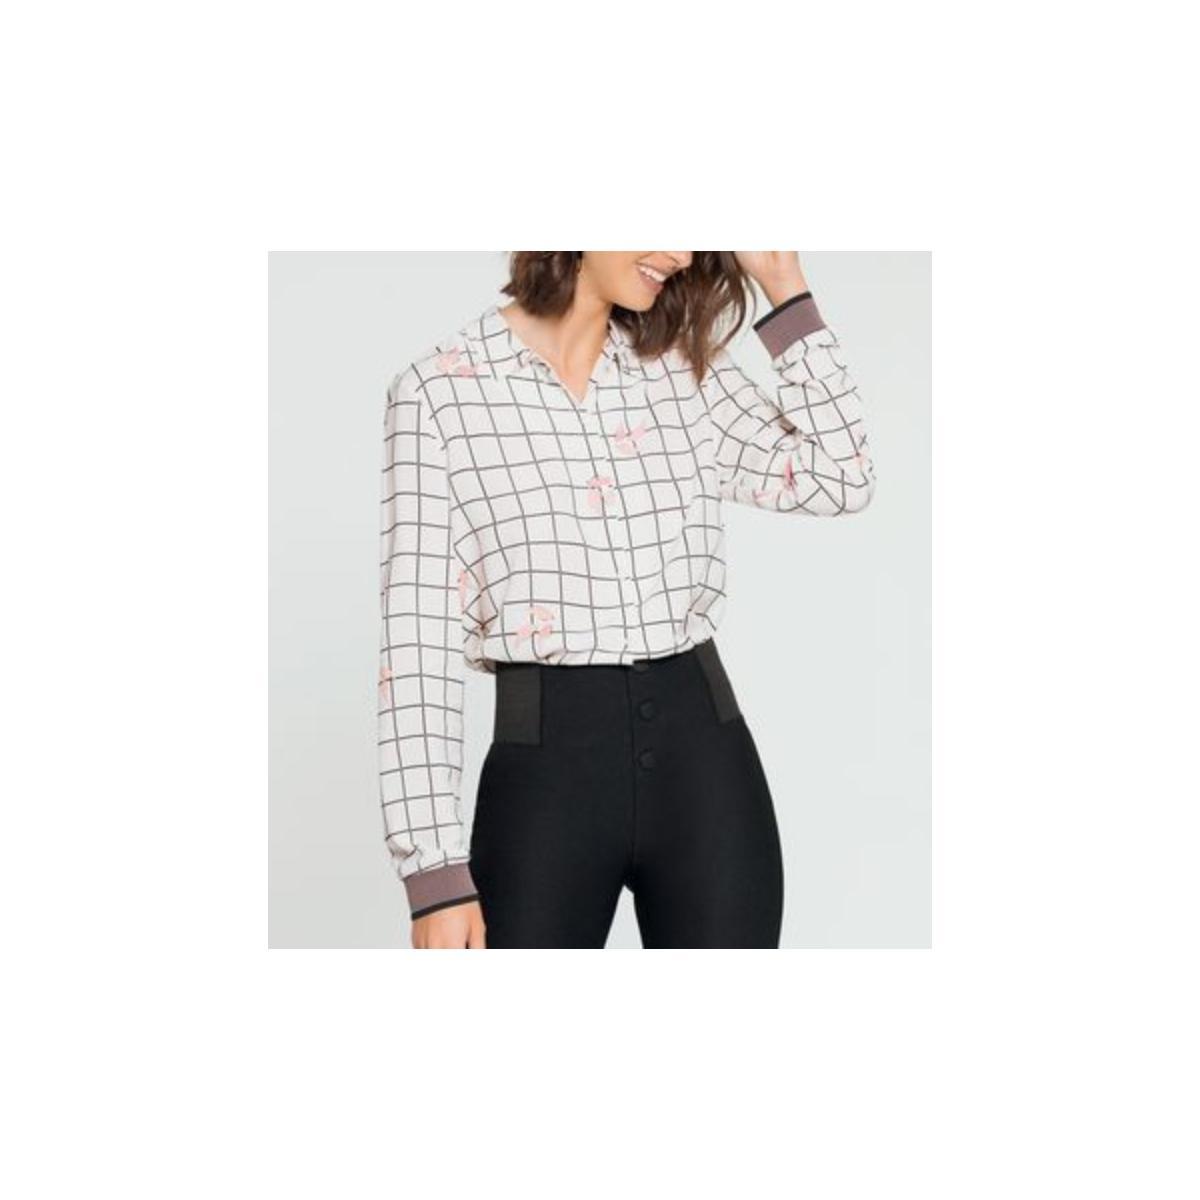 Camisa Feminina Lunender 60100 Branco